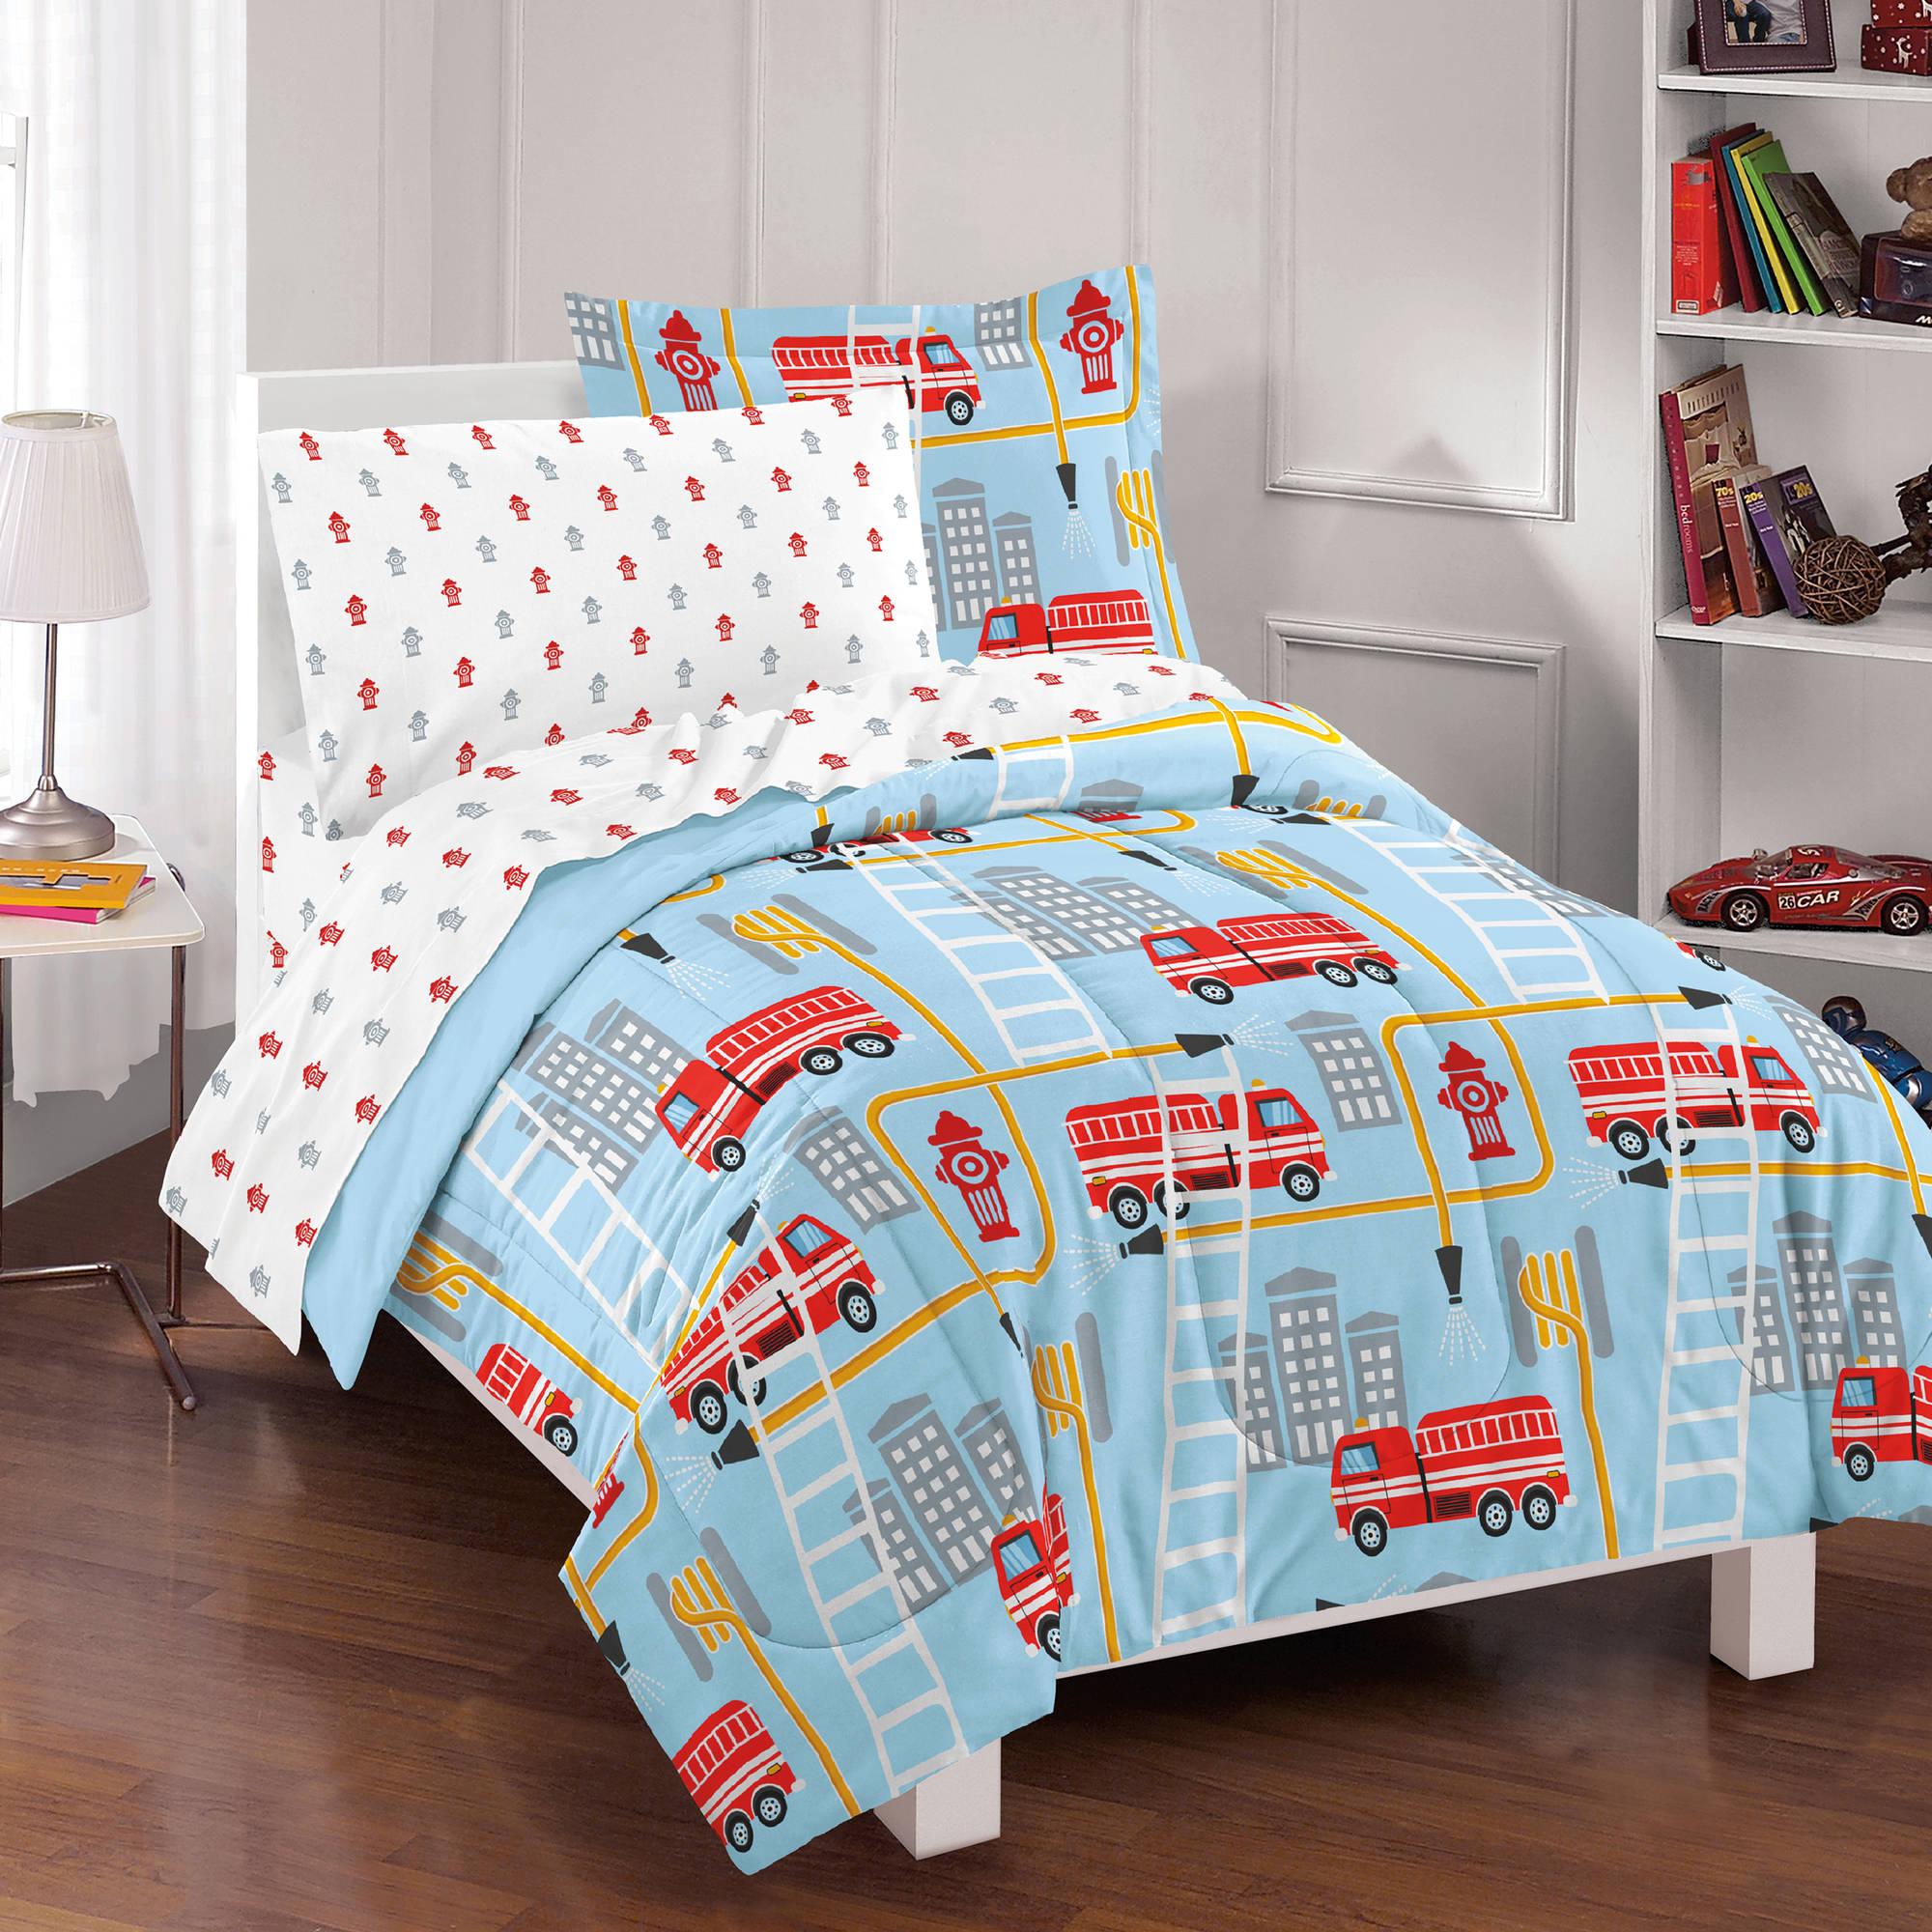 Dream Factory Fire Truck Bed In A Bag Comforter Set,Blue